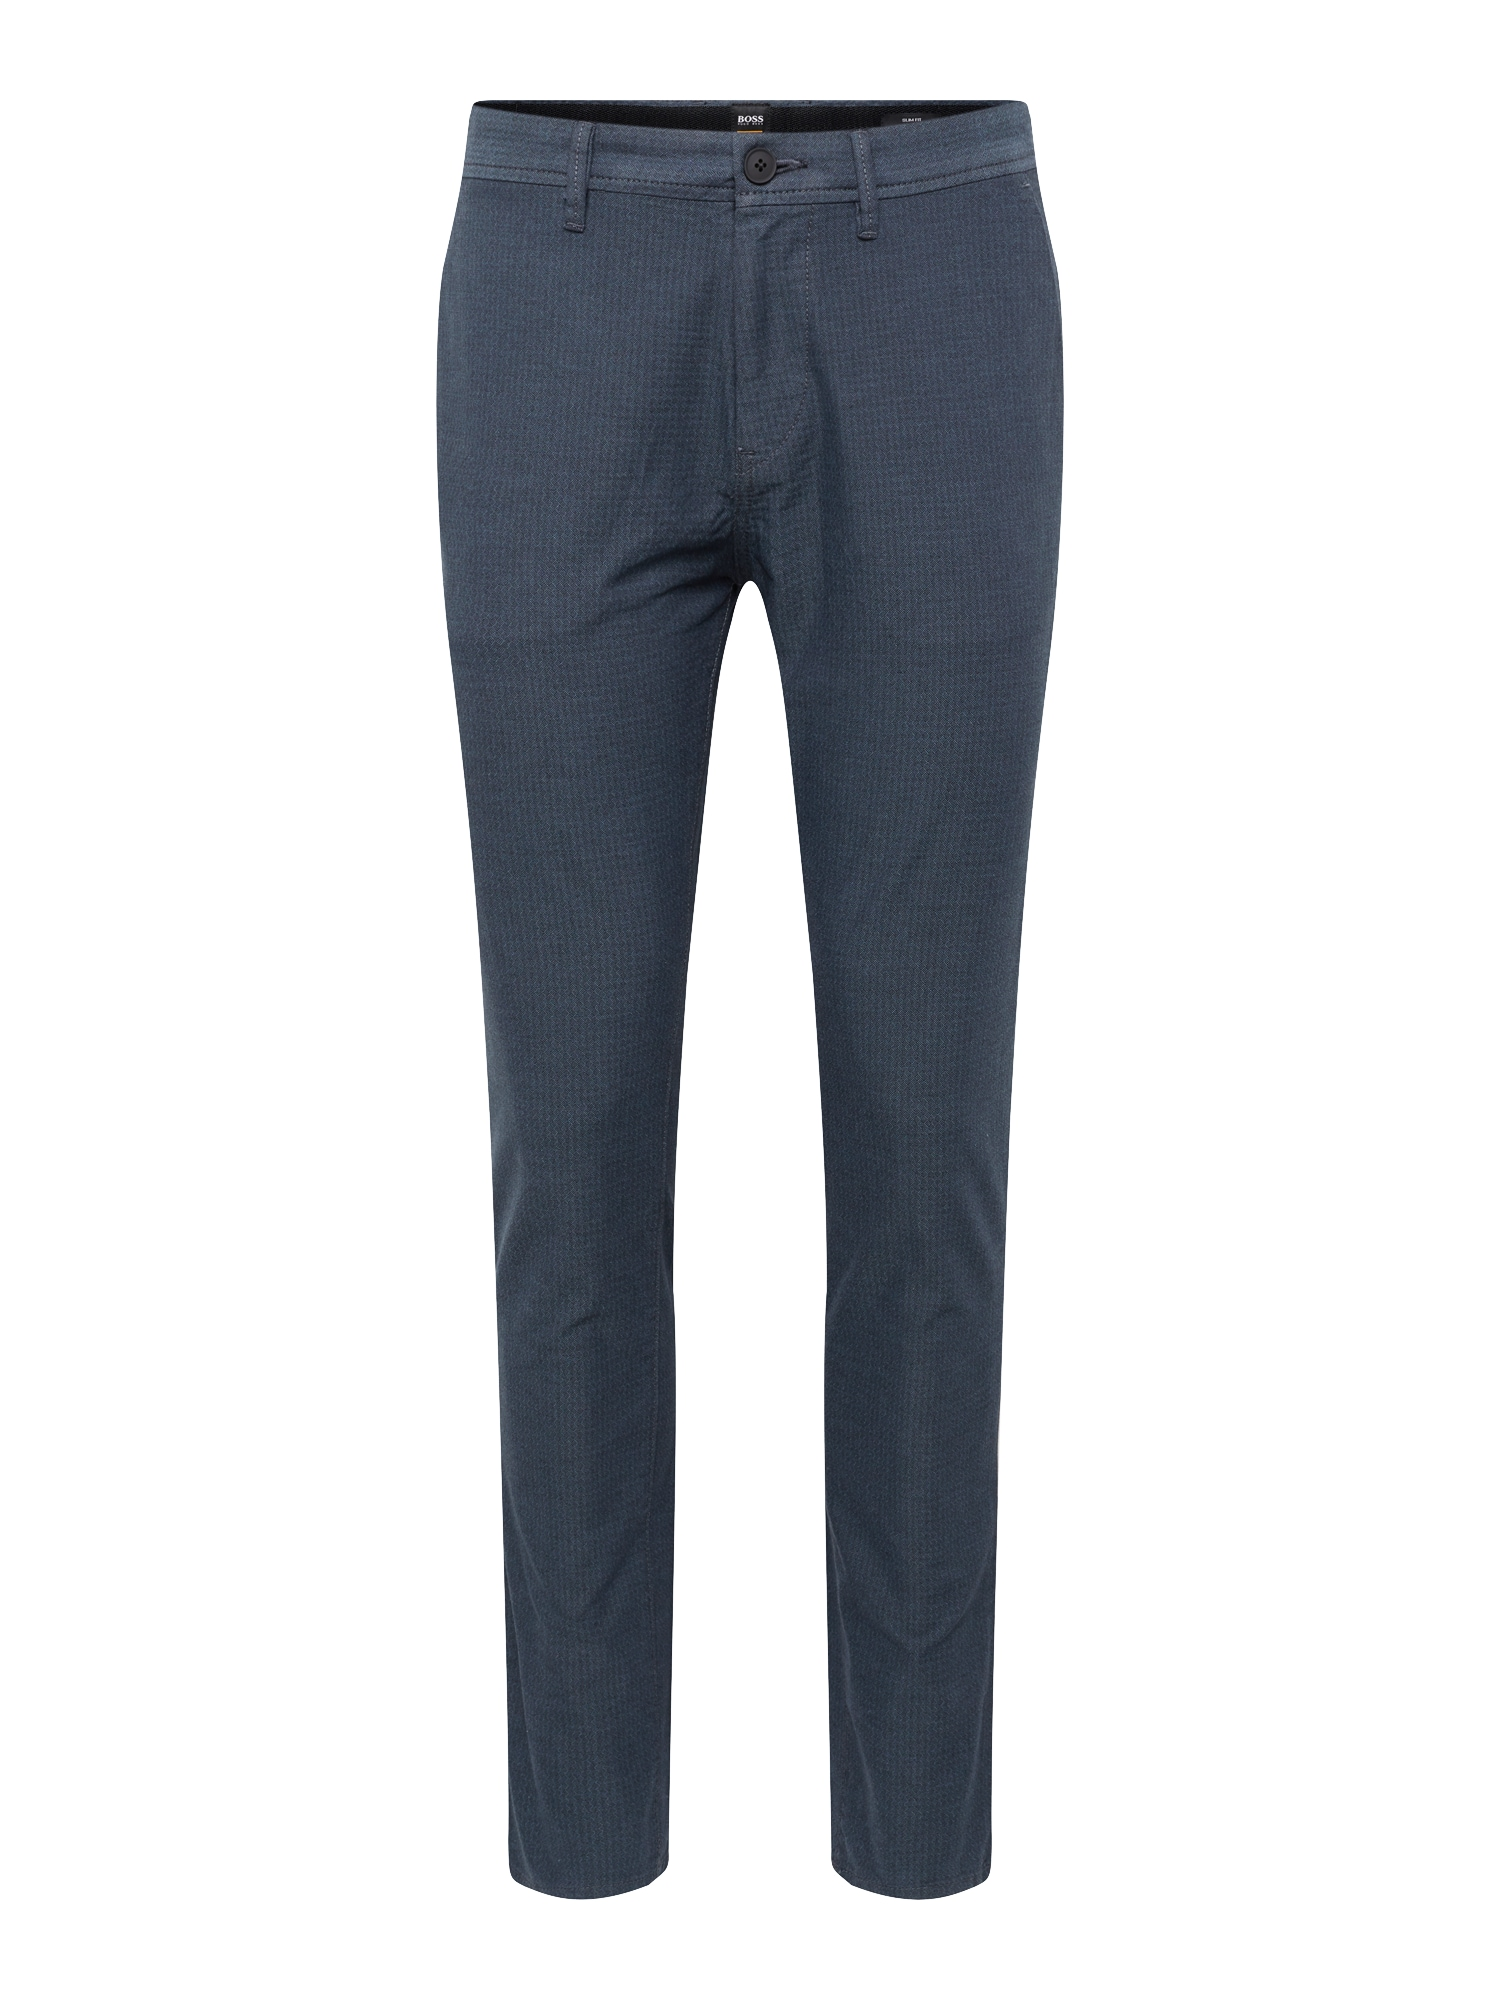 Chino kalhoty Schino-Modern 10212723 01 chladná modrá BOSS